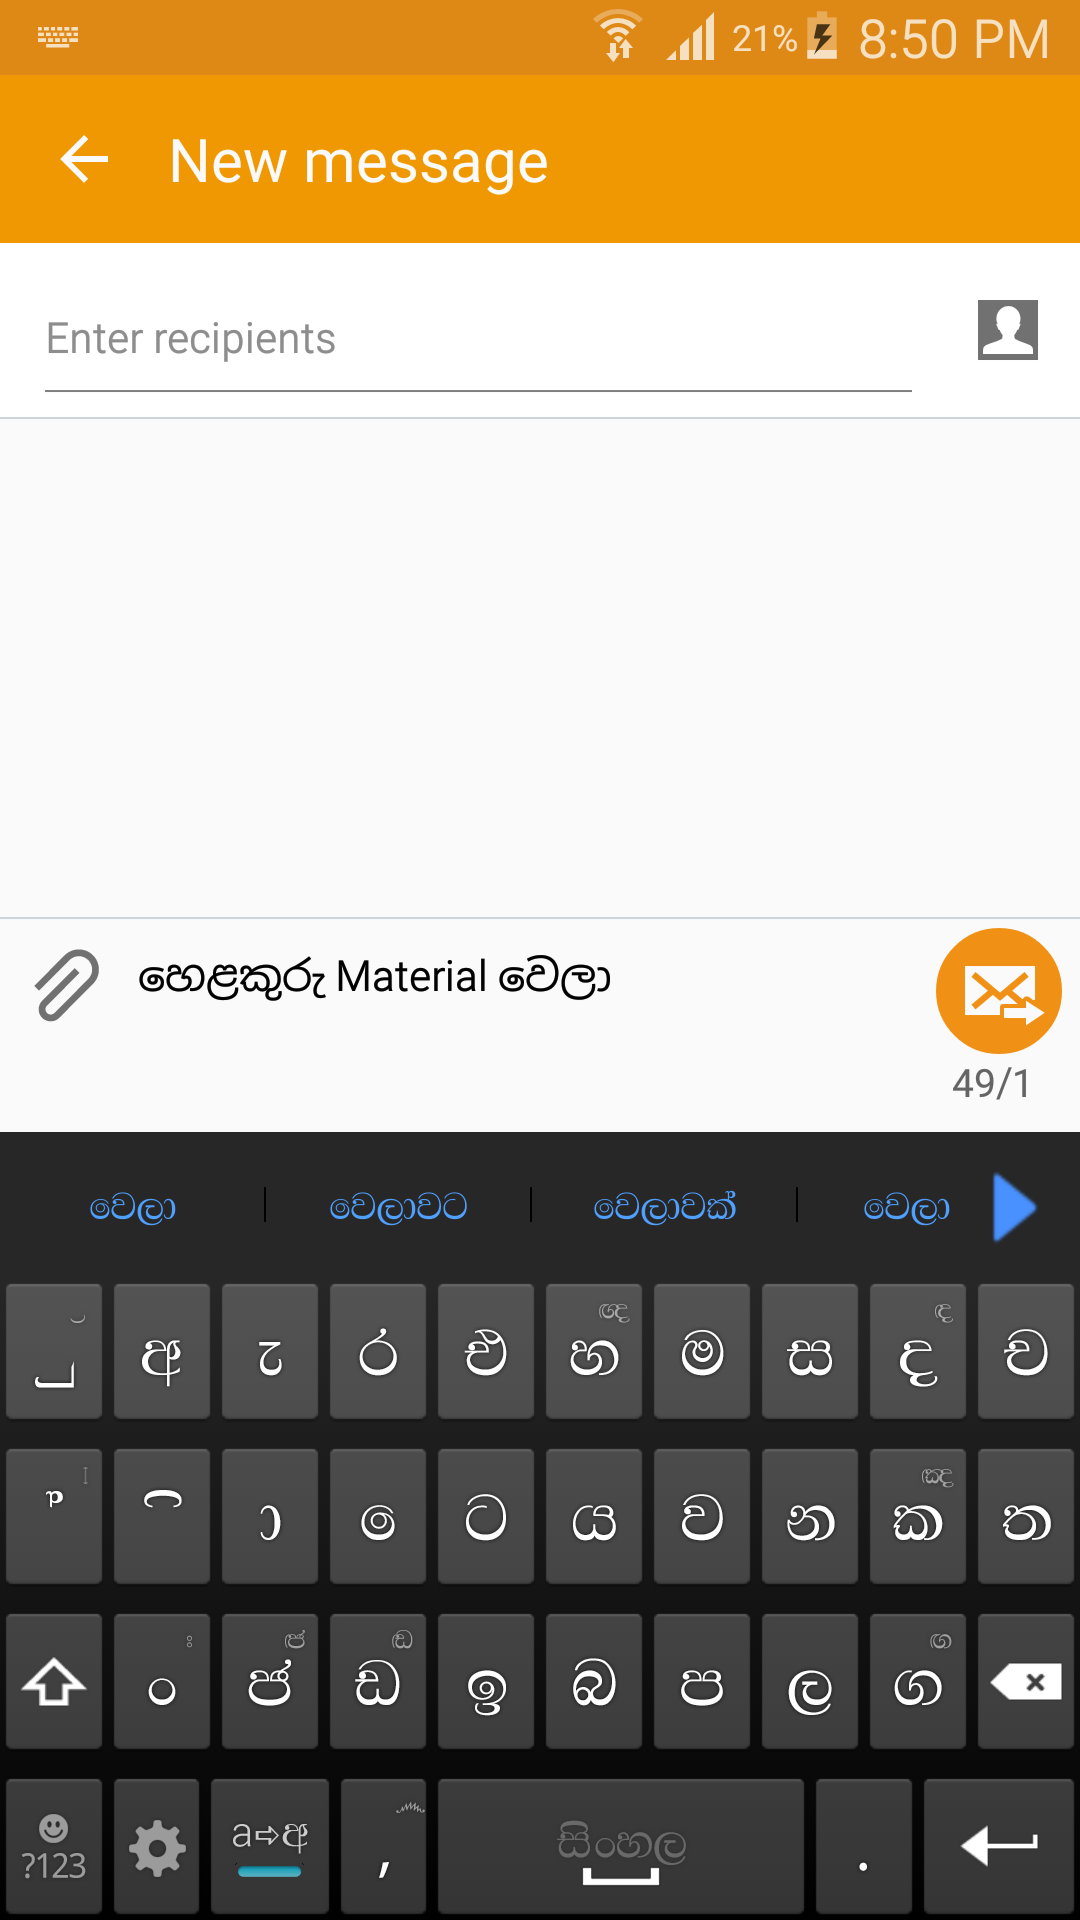 Amazoncom Helakuru - Sinhala Keyboard Input Appstore -7080